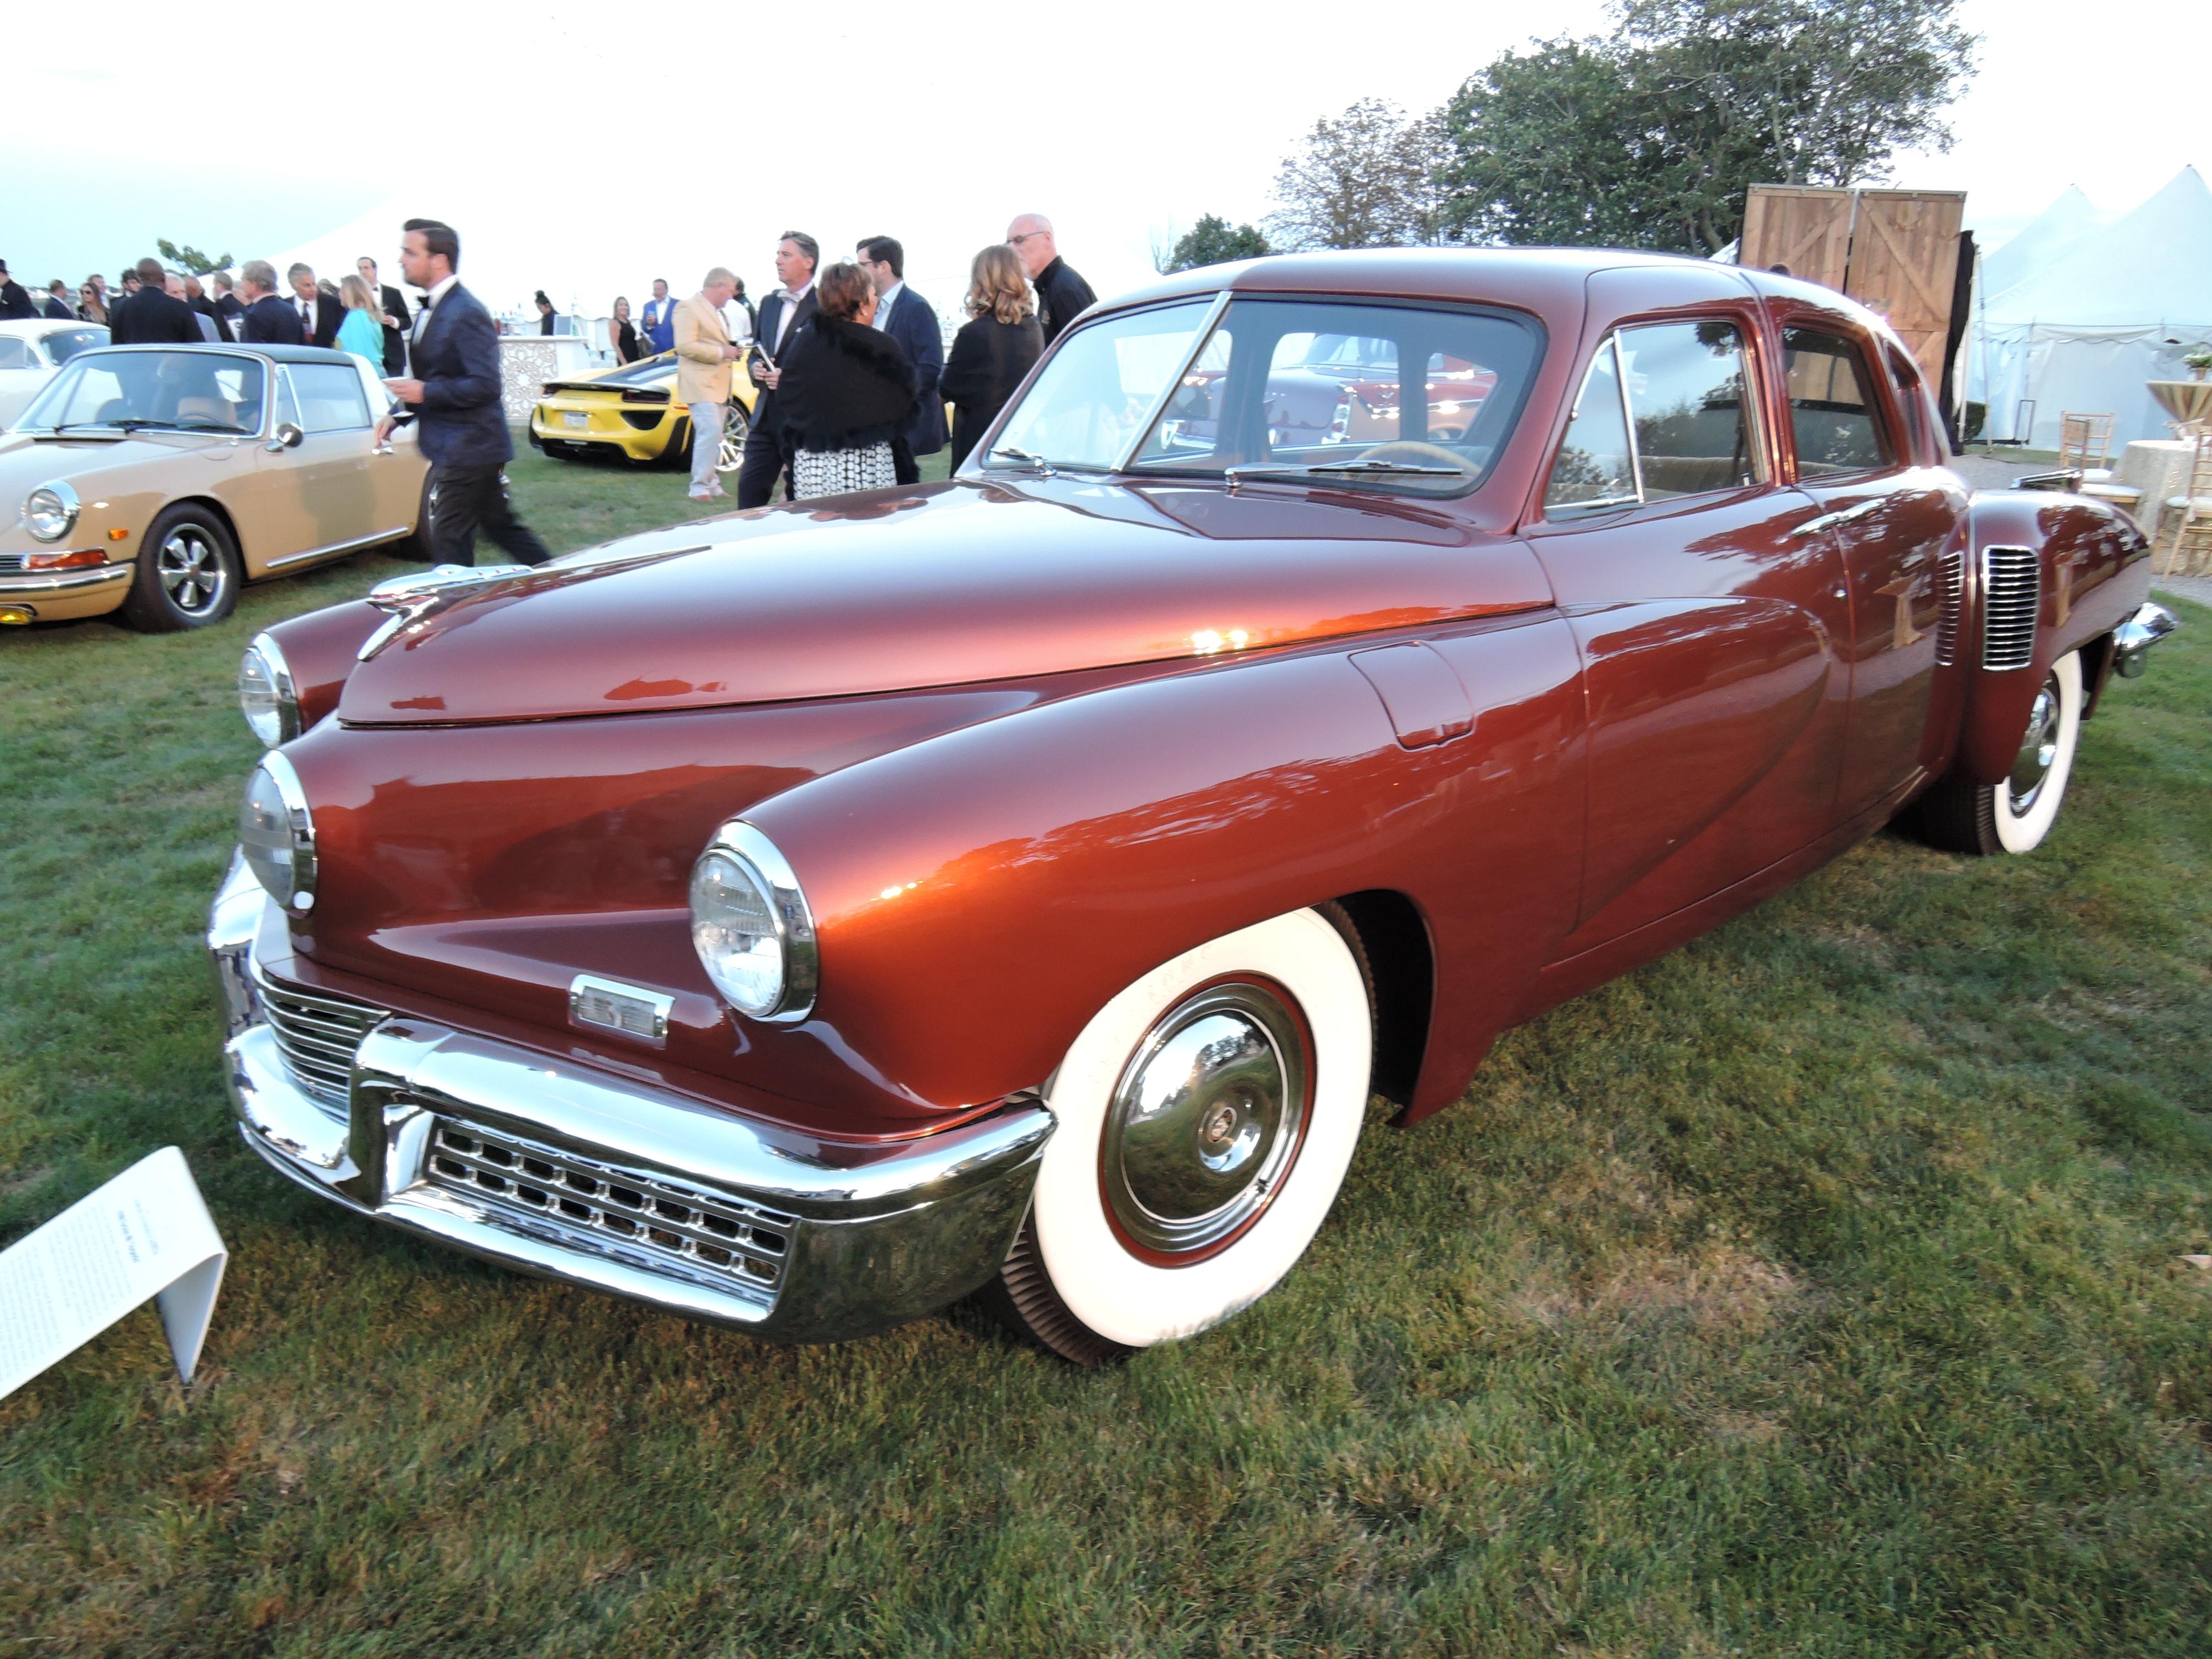 brown 1948 Tucker 48 Torpedo - Audrain Auto Museum Gala 2017